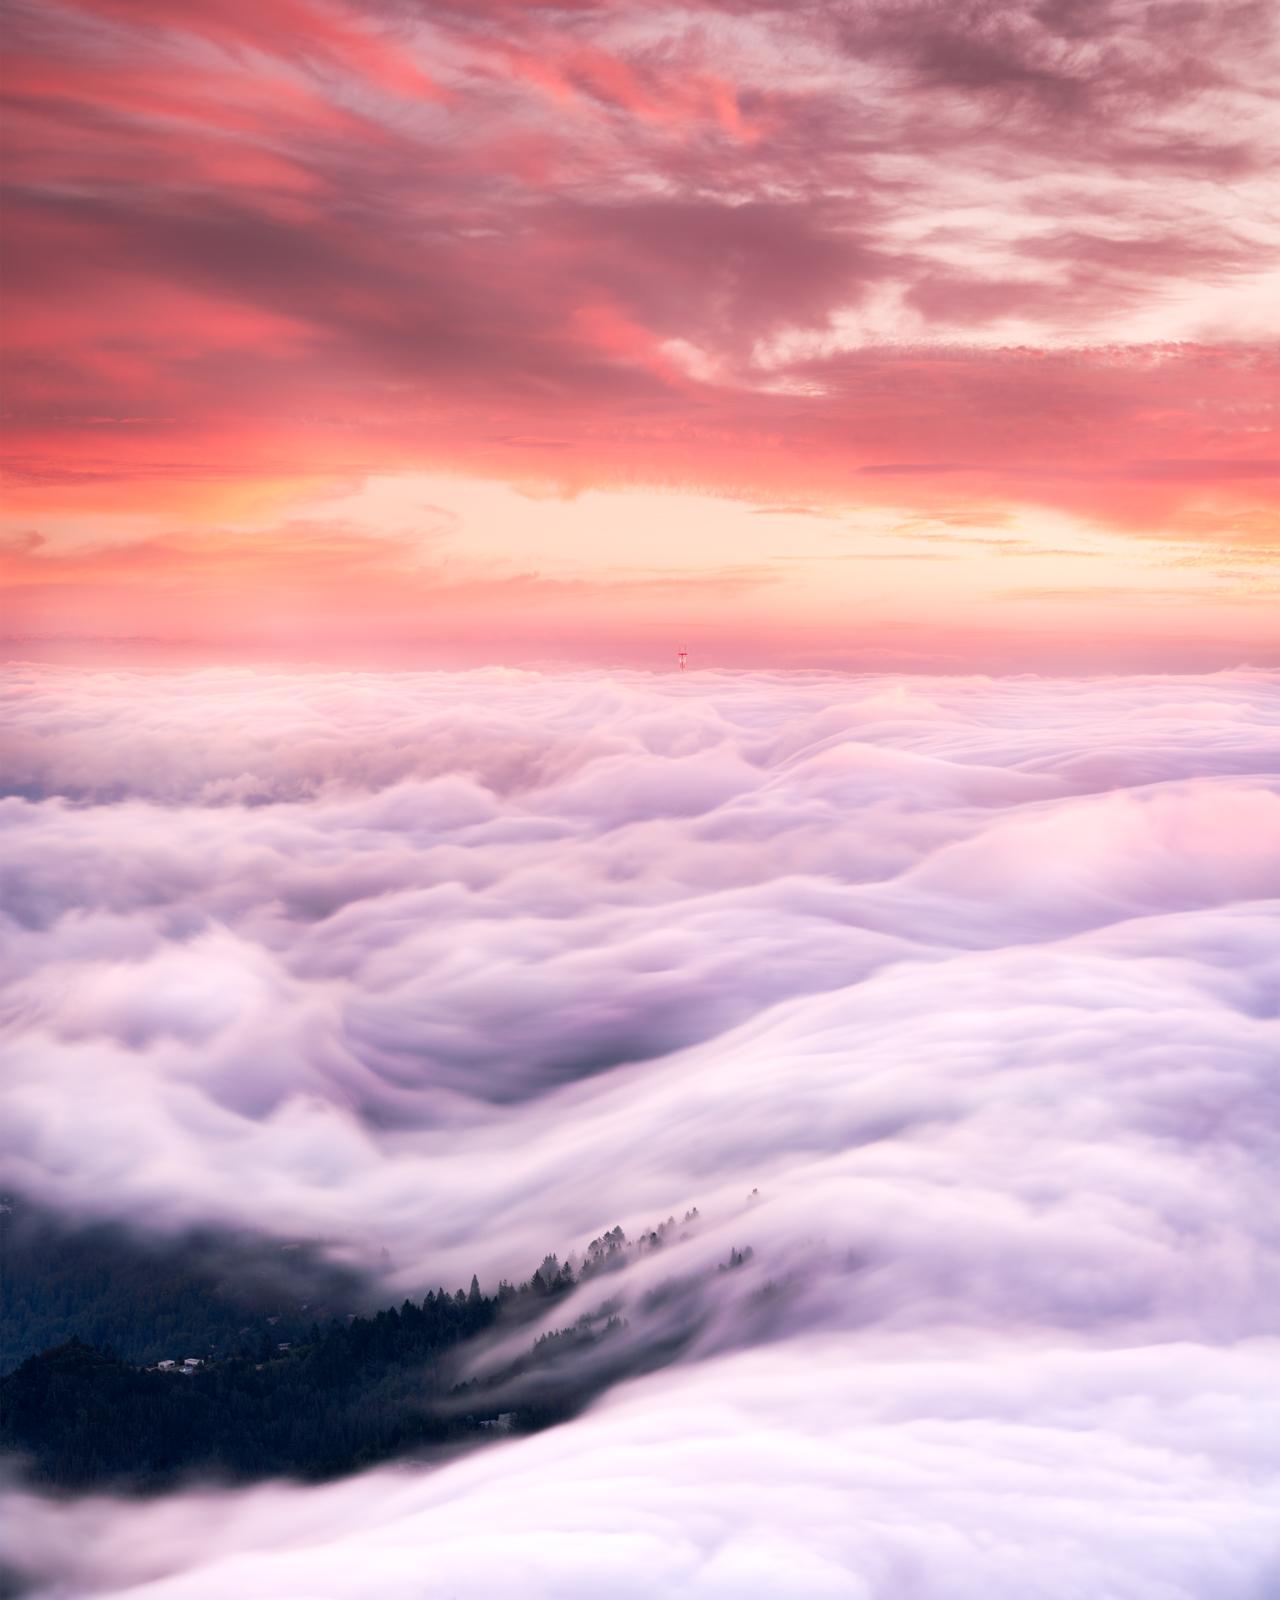 Mount Tamalpais East Peak, California